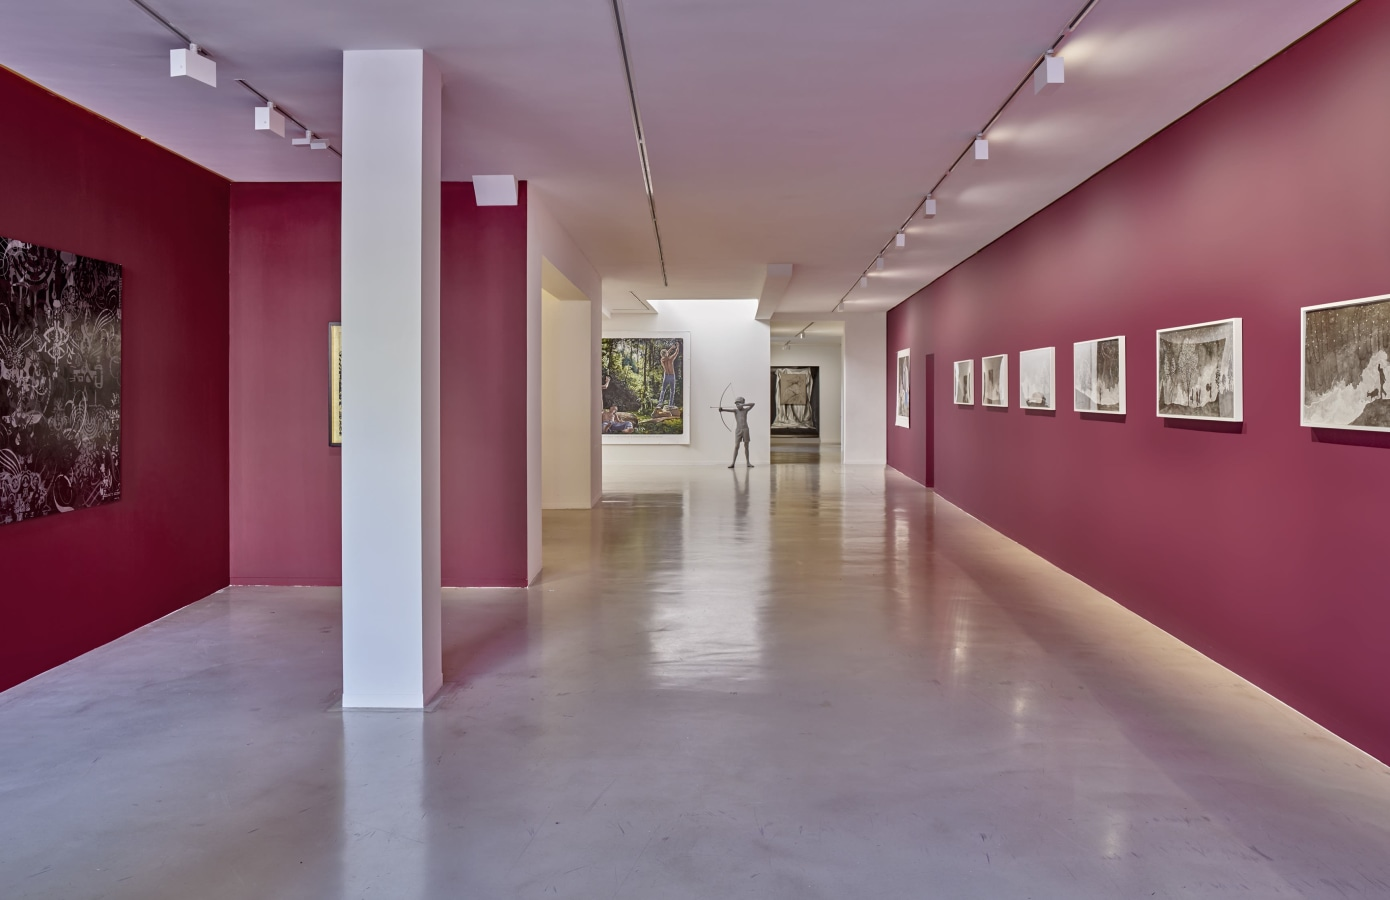 Changez! Art Brussels in Amsterdam, Hans Op de Beeck, Anthony Goicolea, Ryan McGinness, Muntean/Rosenblum, Renato Nicolodi, Jacco Olivier, Levi van Veluw,